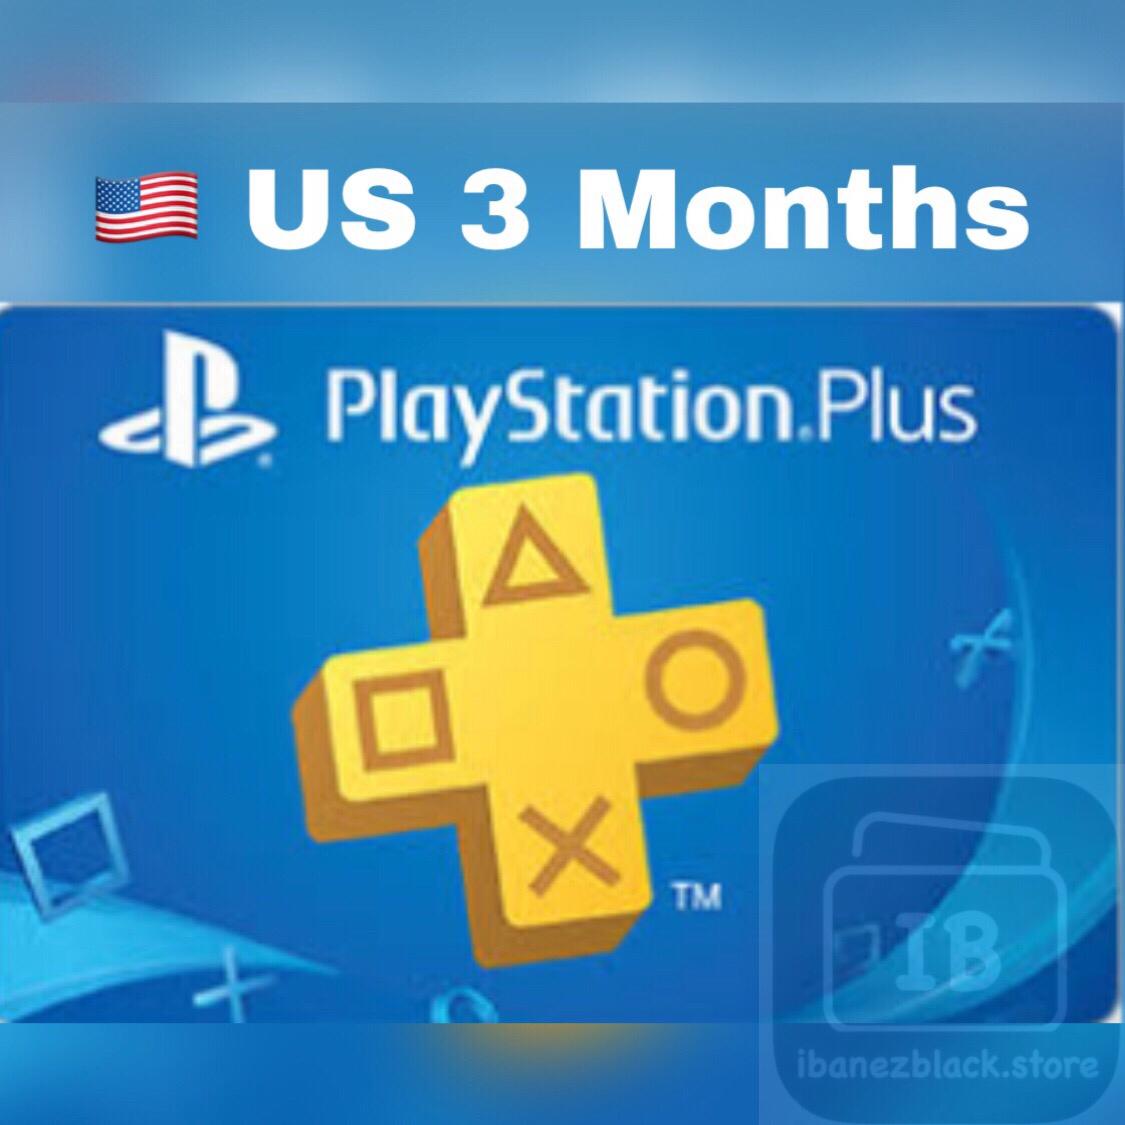 Playstation Plus / PSN Plus US 3 Months Membership